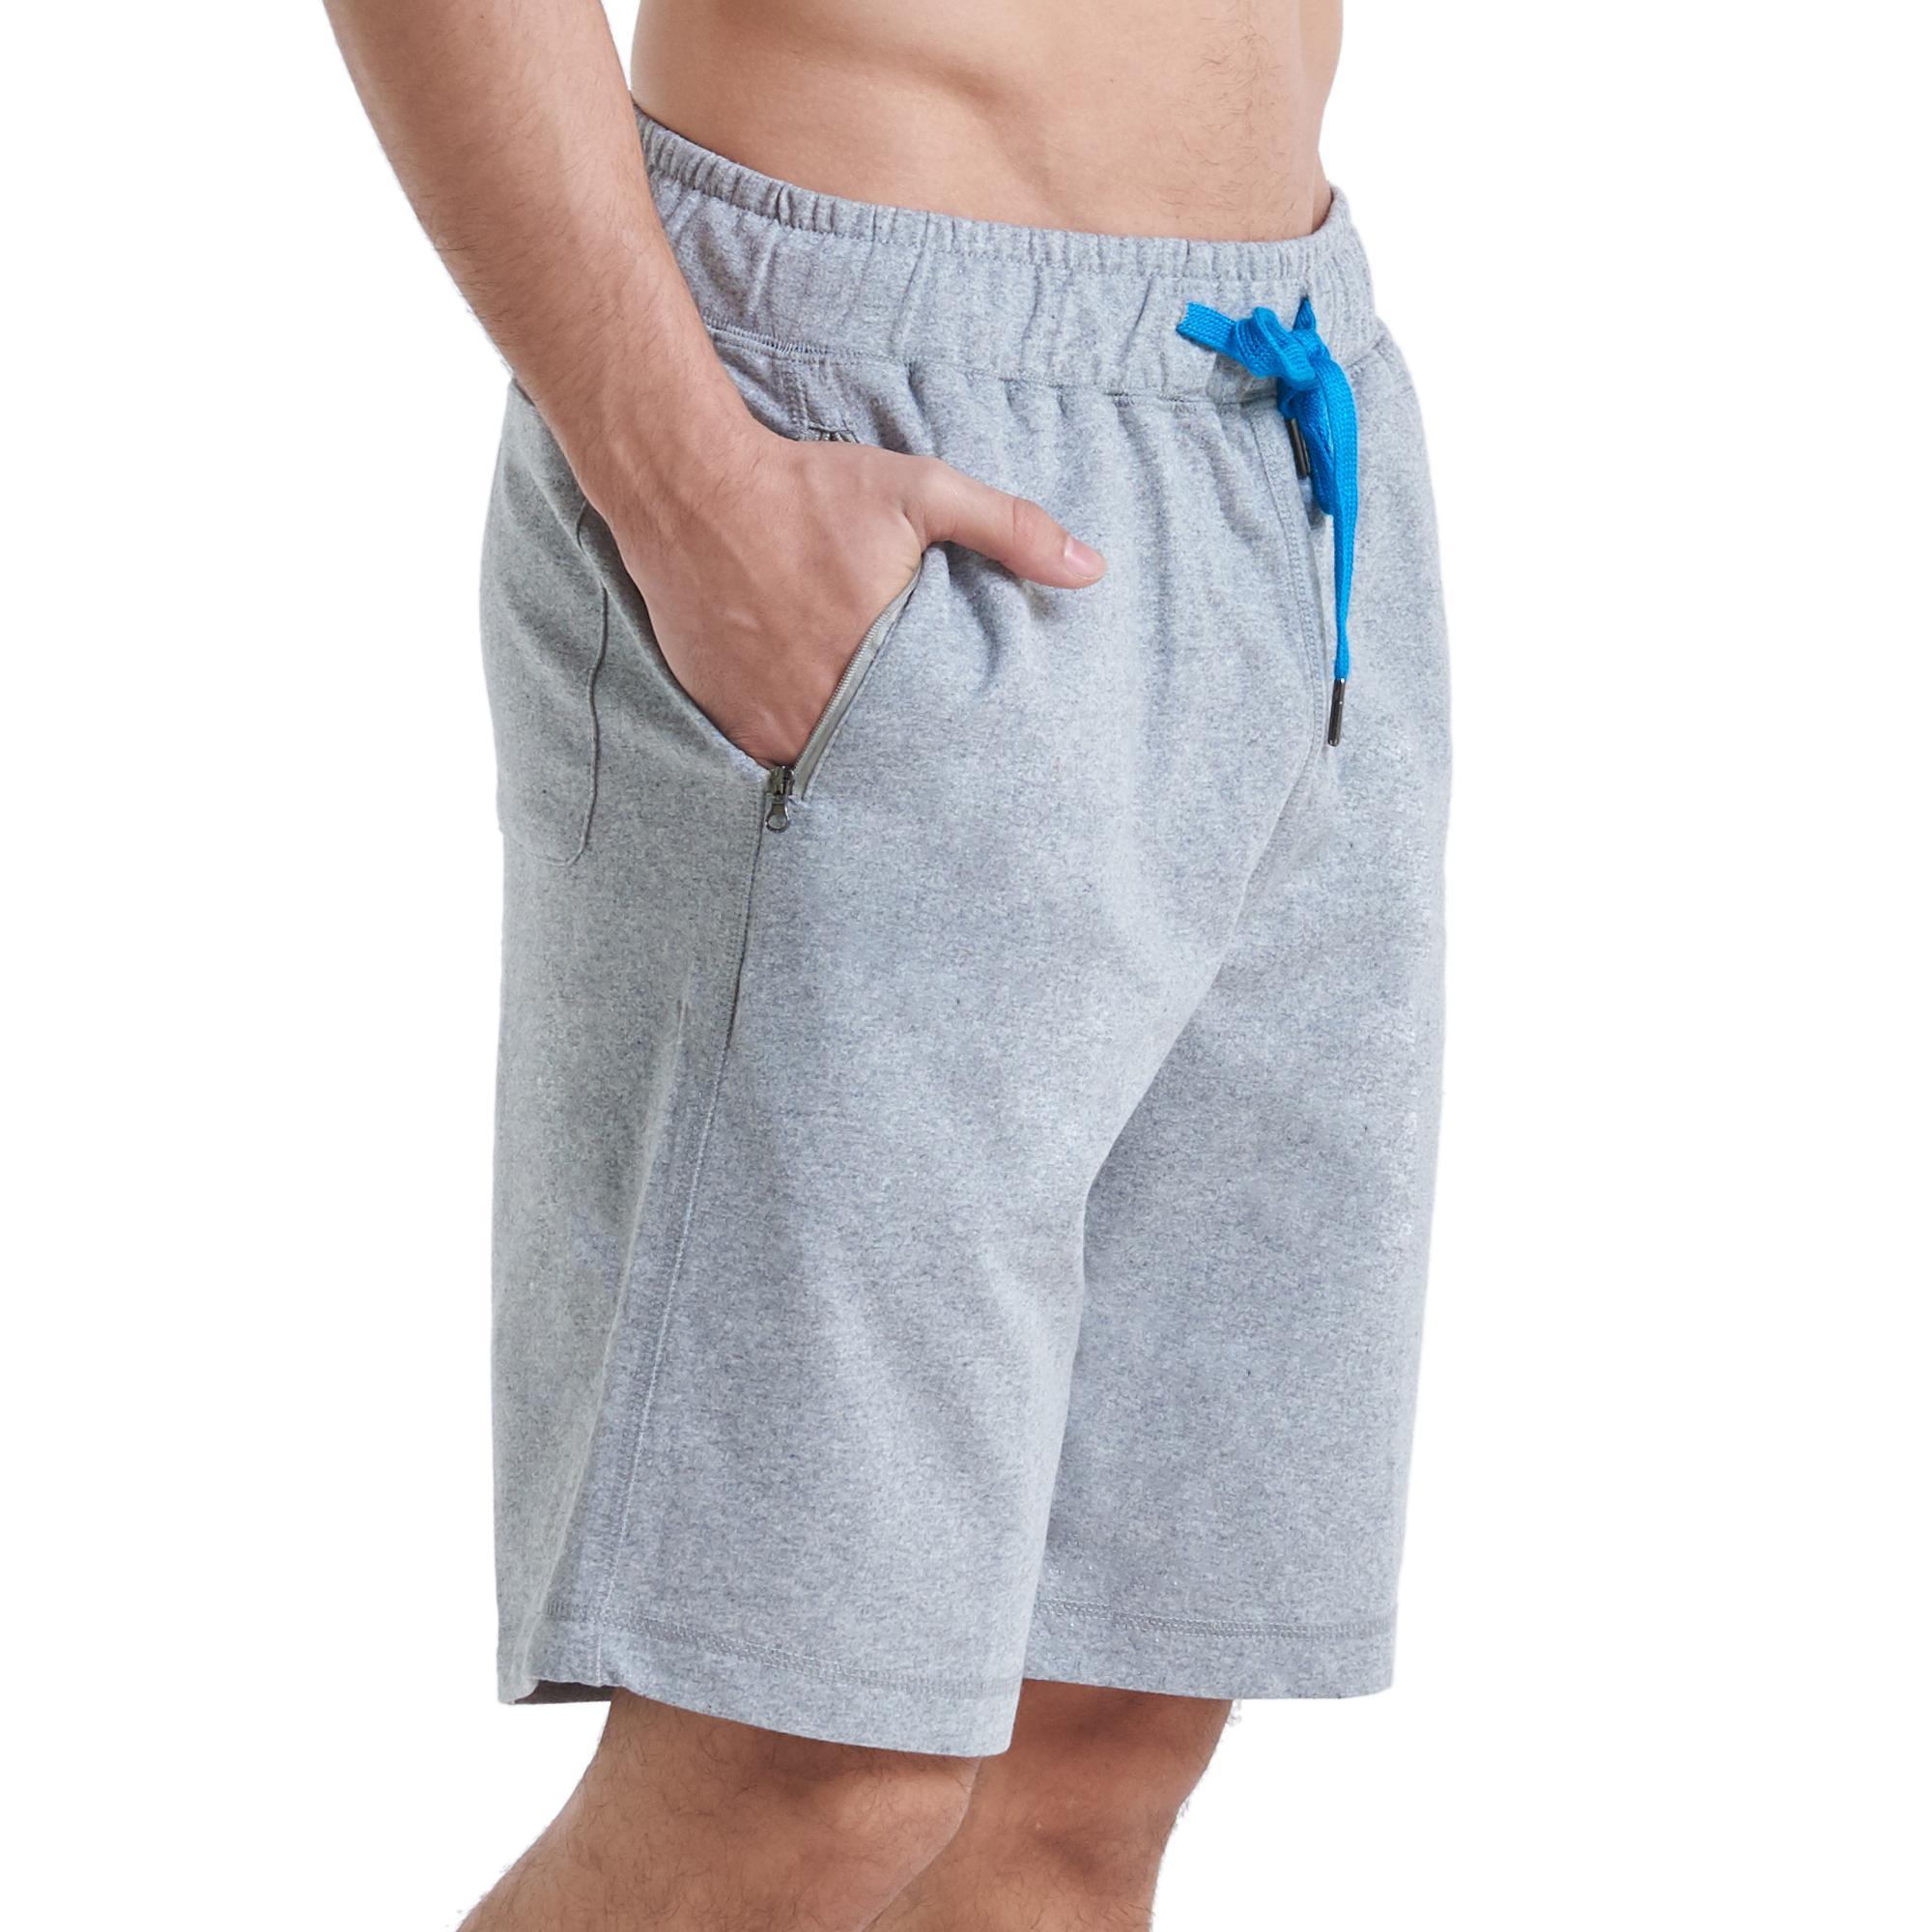 Huga Activewear Ultra Soft Travel Jogger Summer Shorts For Men With Zipper Lined Pockets By Huga.